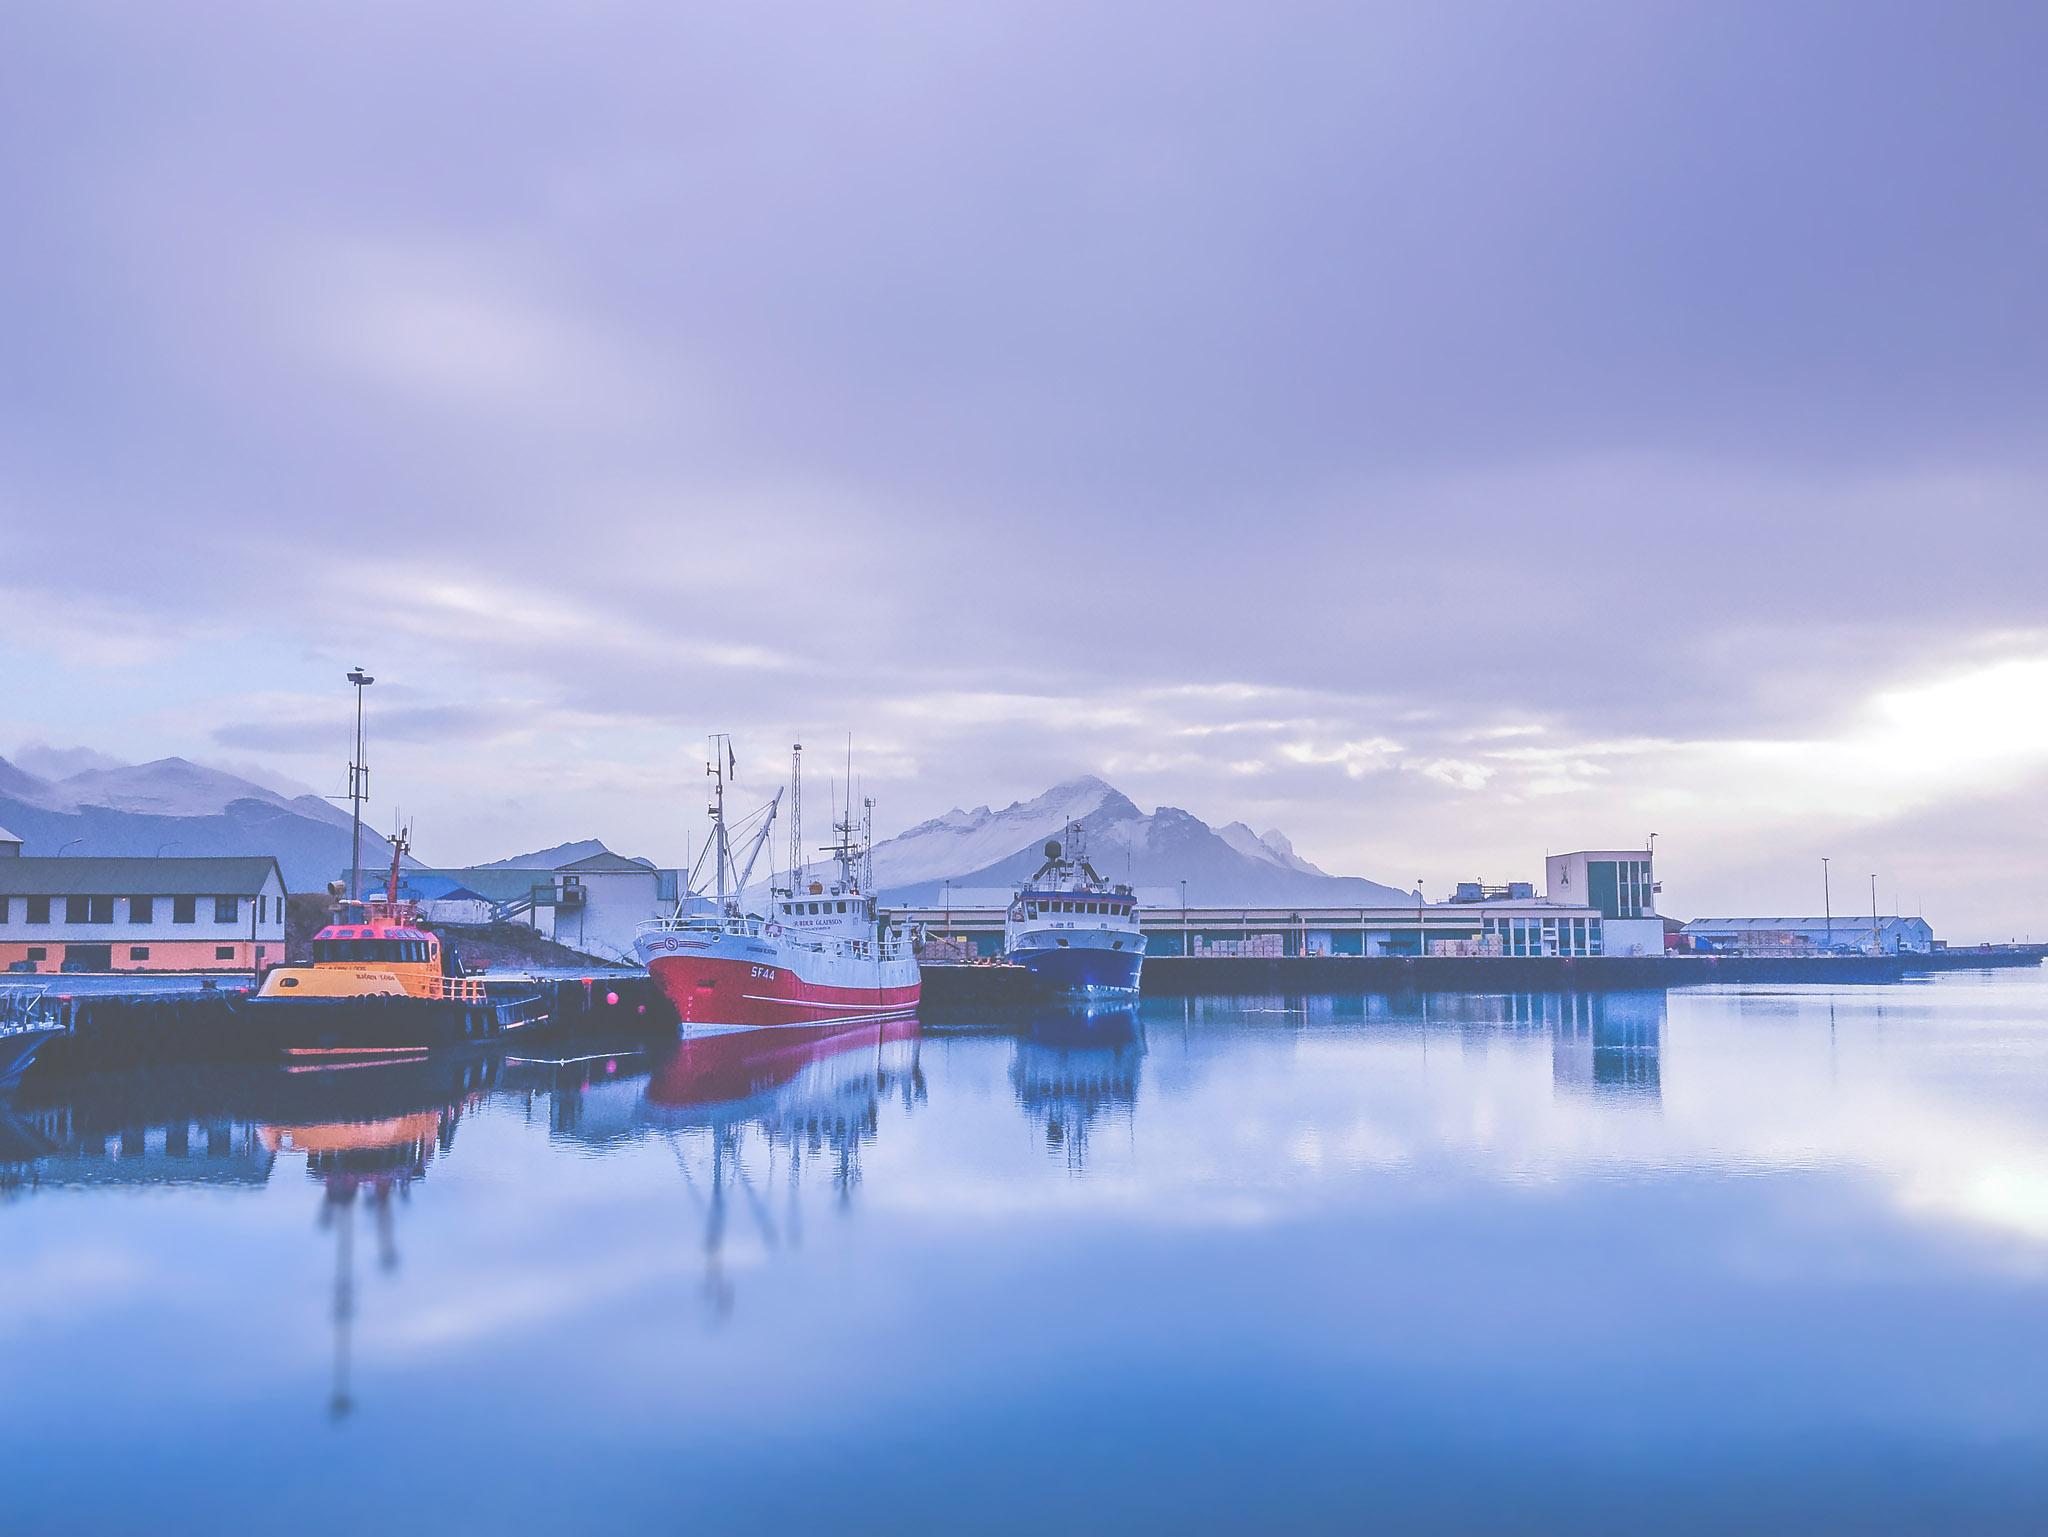 ICELAND-IPHONE-WEB-11.jpg